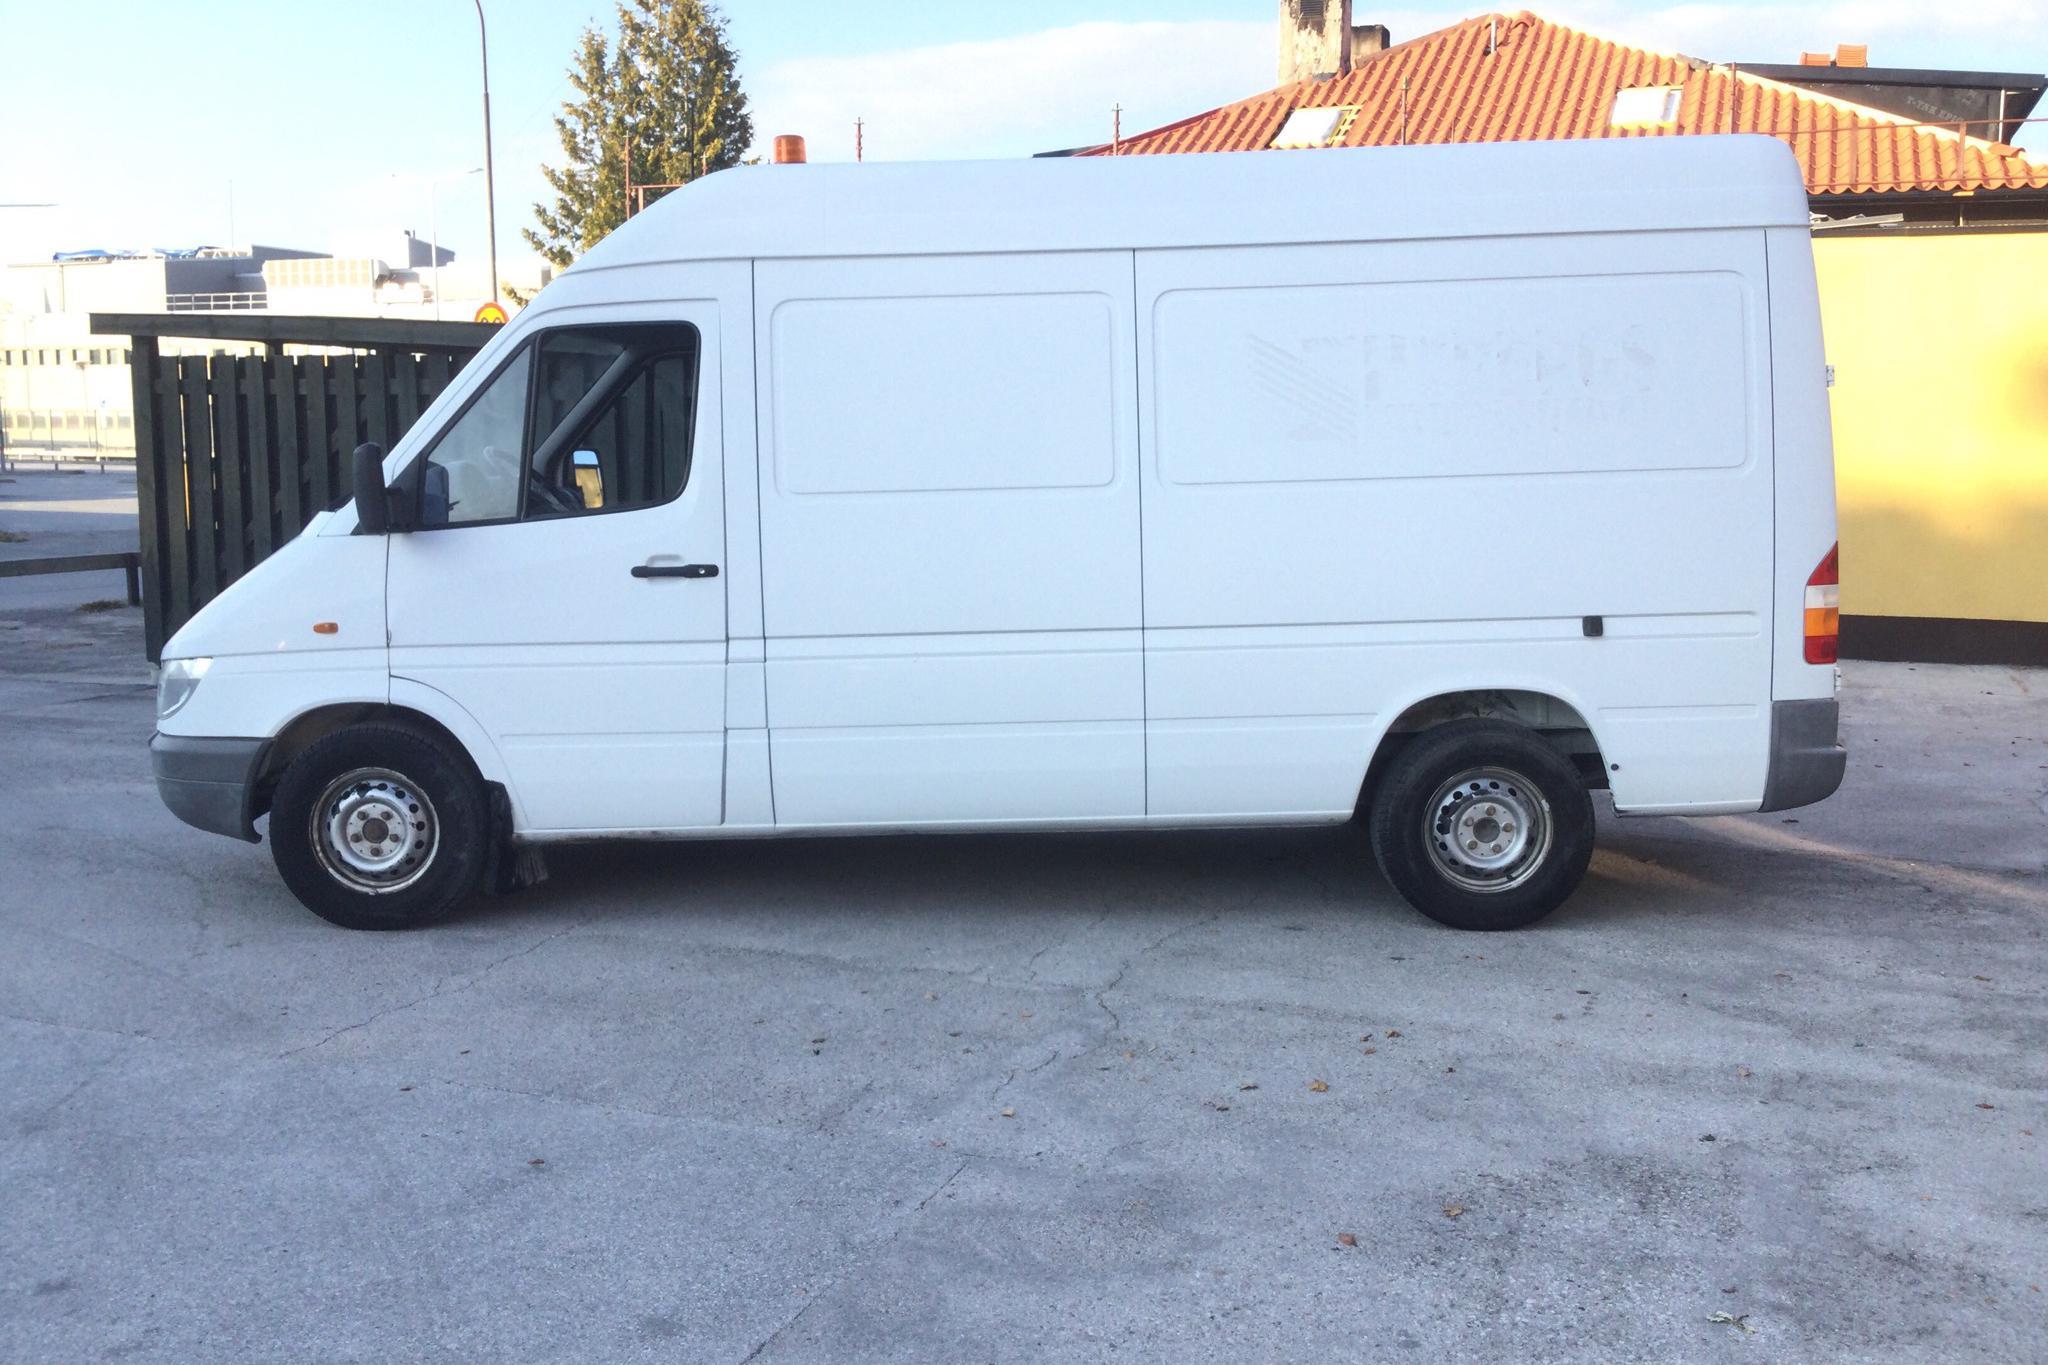 Mercedes Sprinter 313 CDI (129hk) - 221 310 km - Automatic - white - 2002